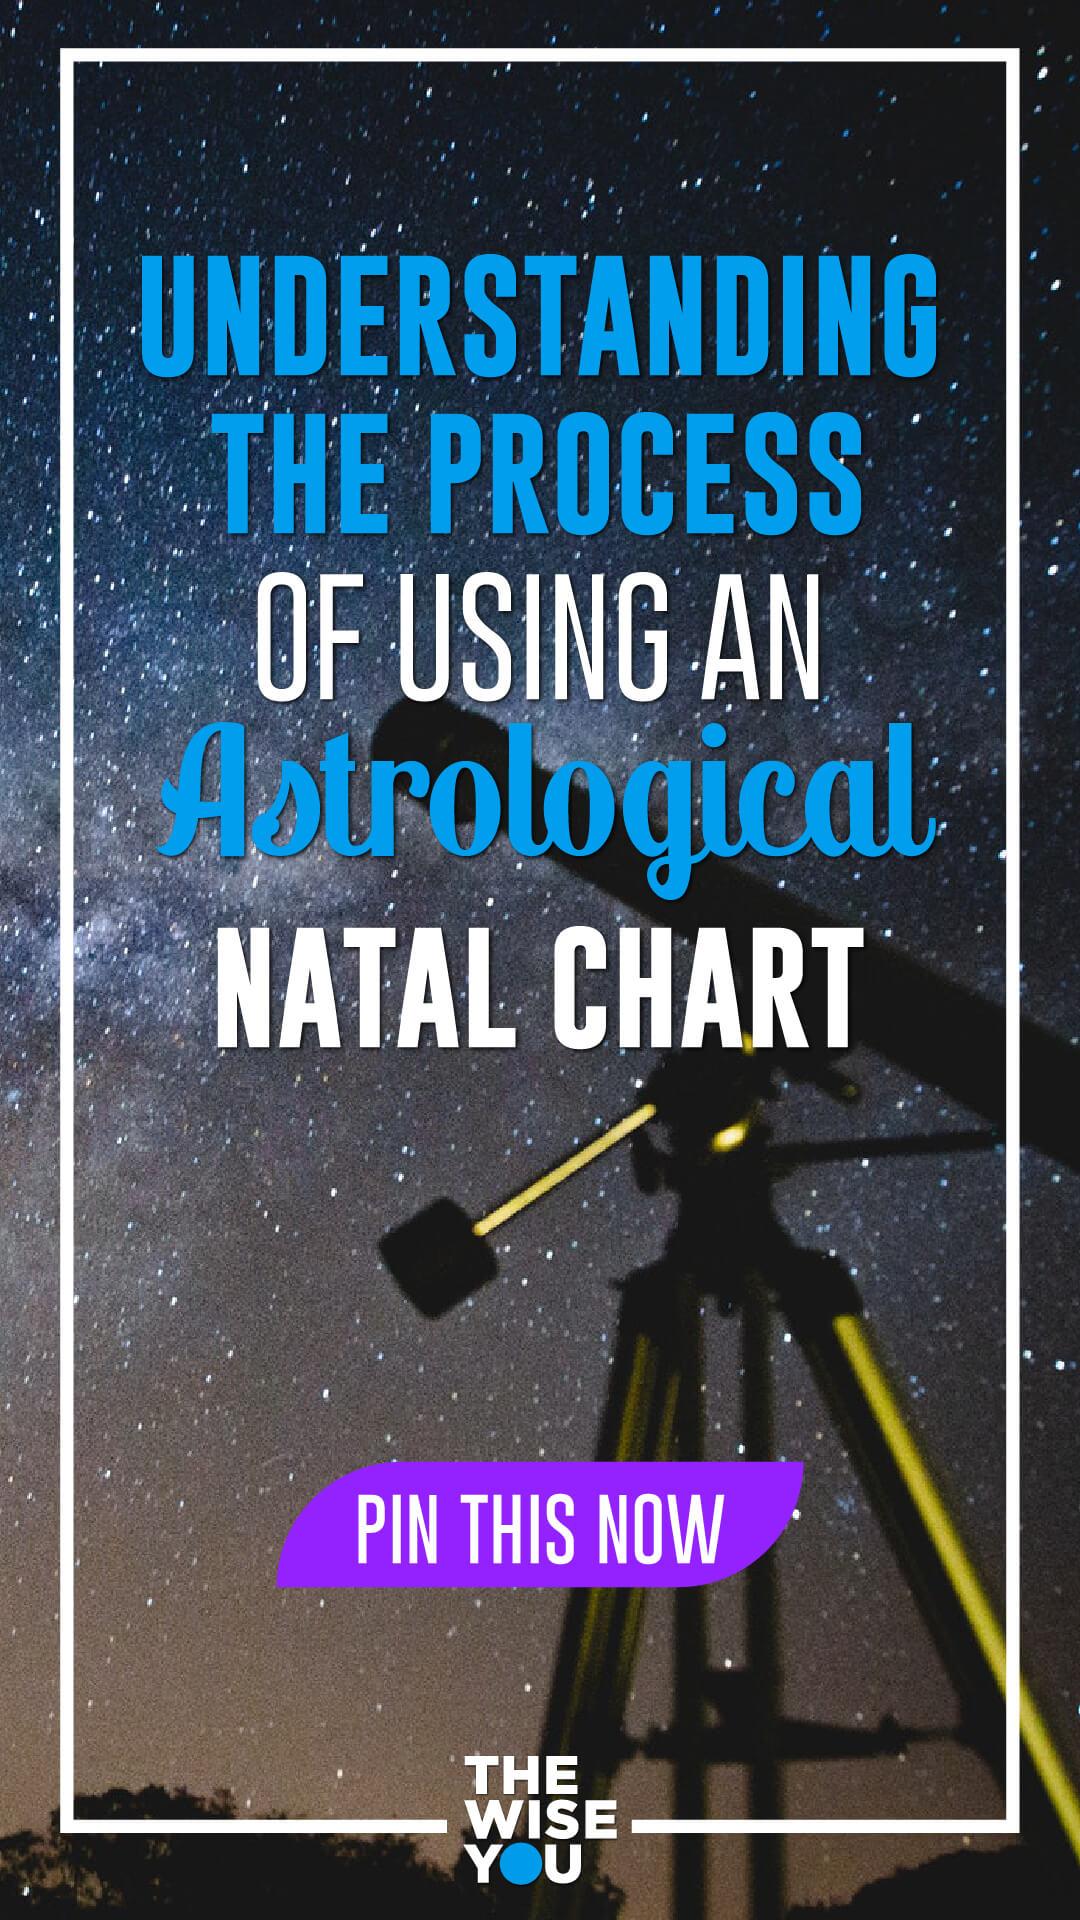 Understanding The Process Of Using an Astrological Natal Chart